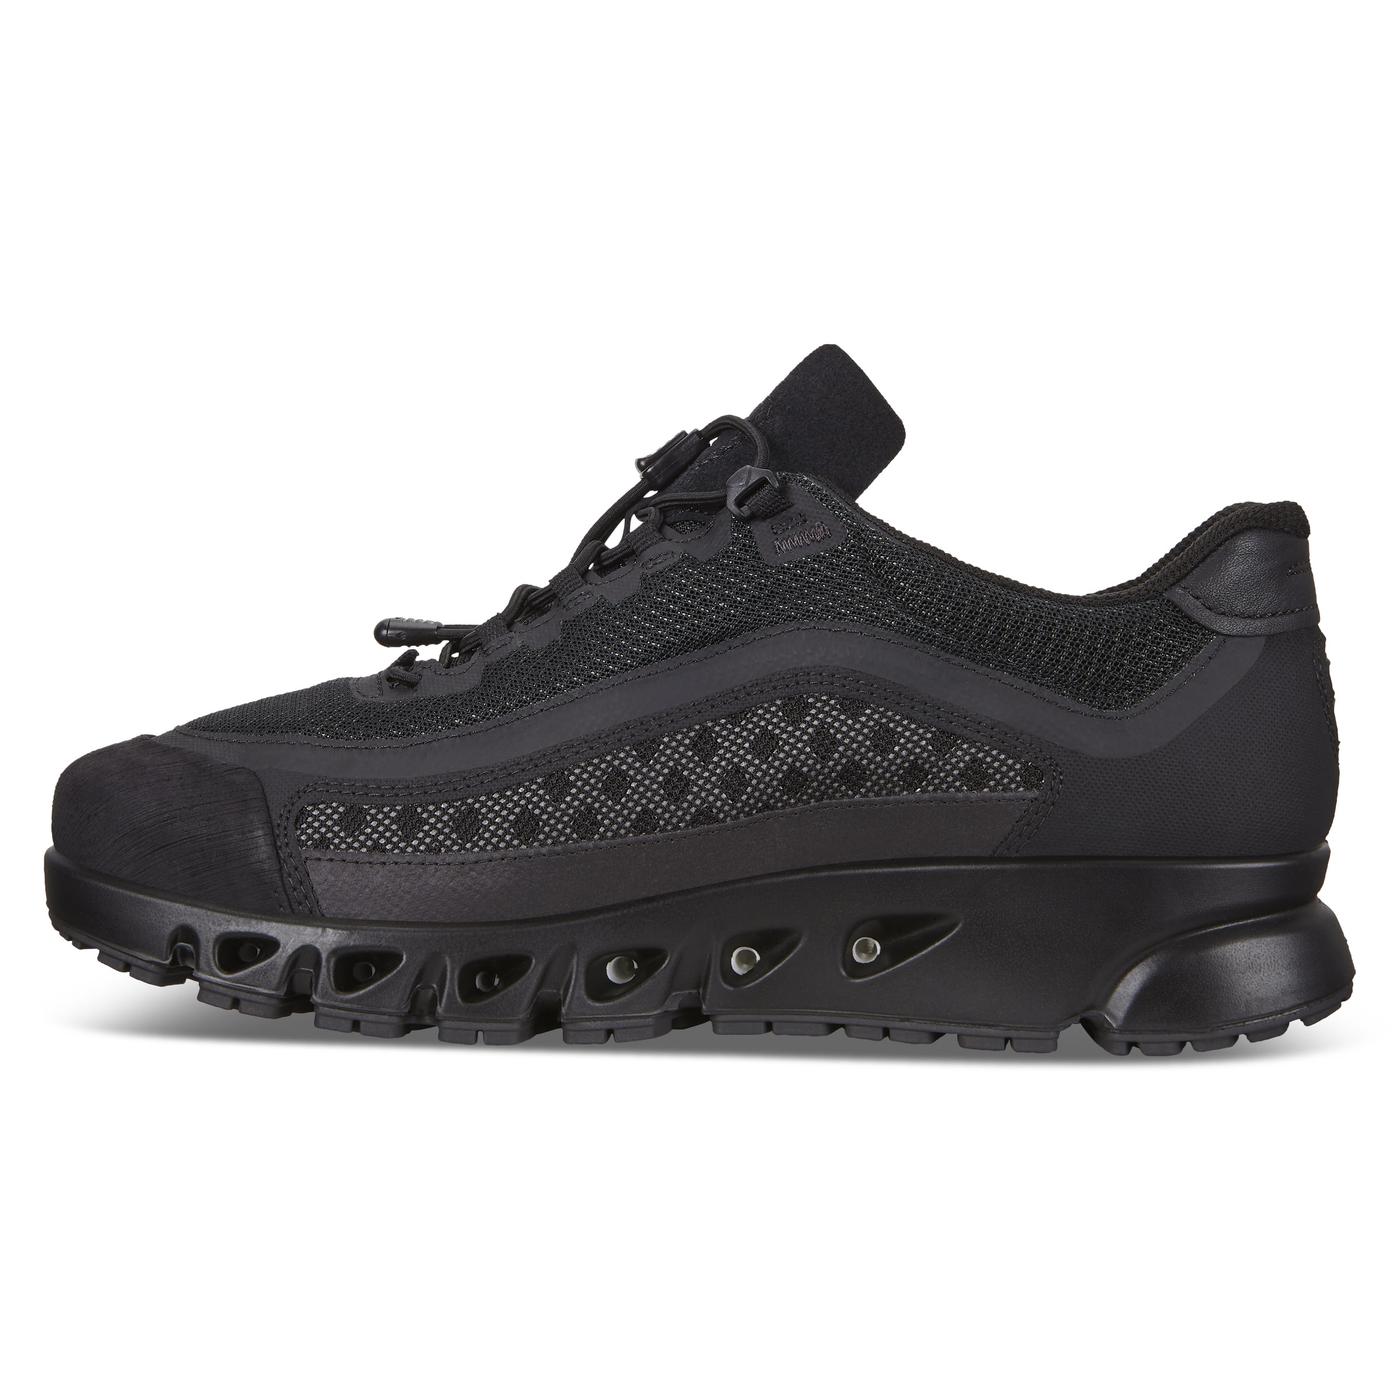 ECCO MULTI-VENT Mens Outdoor Textile Mesh Sneaker